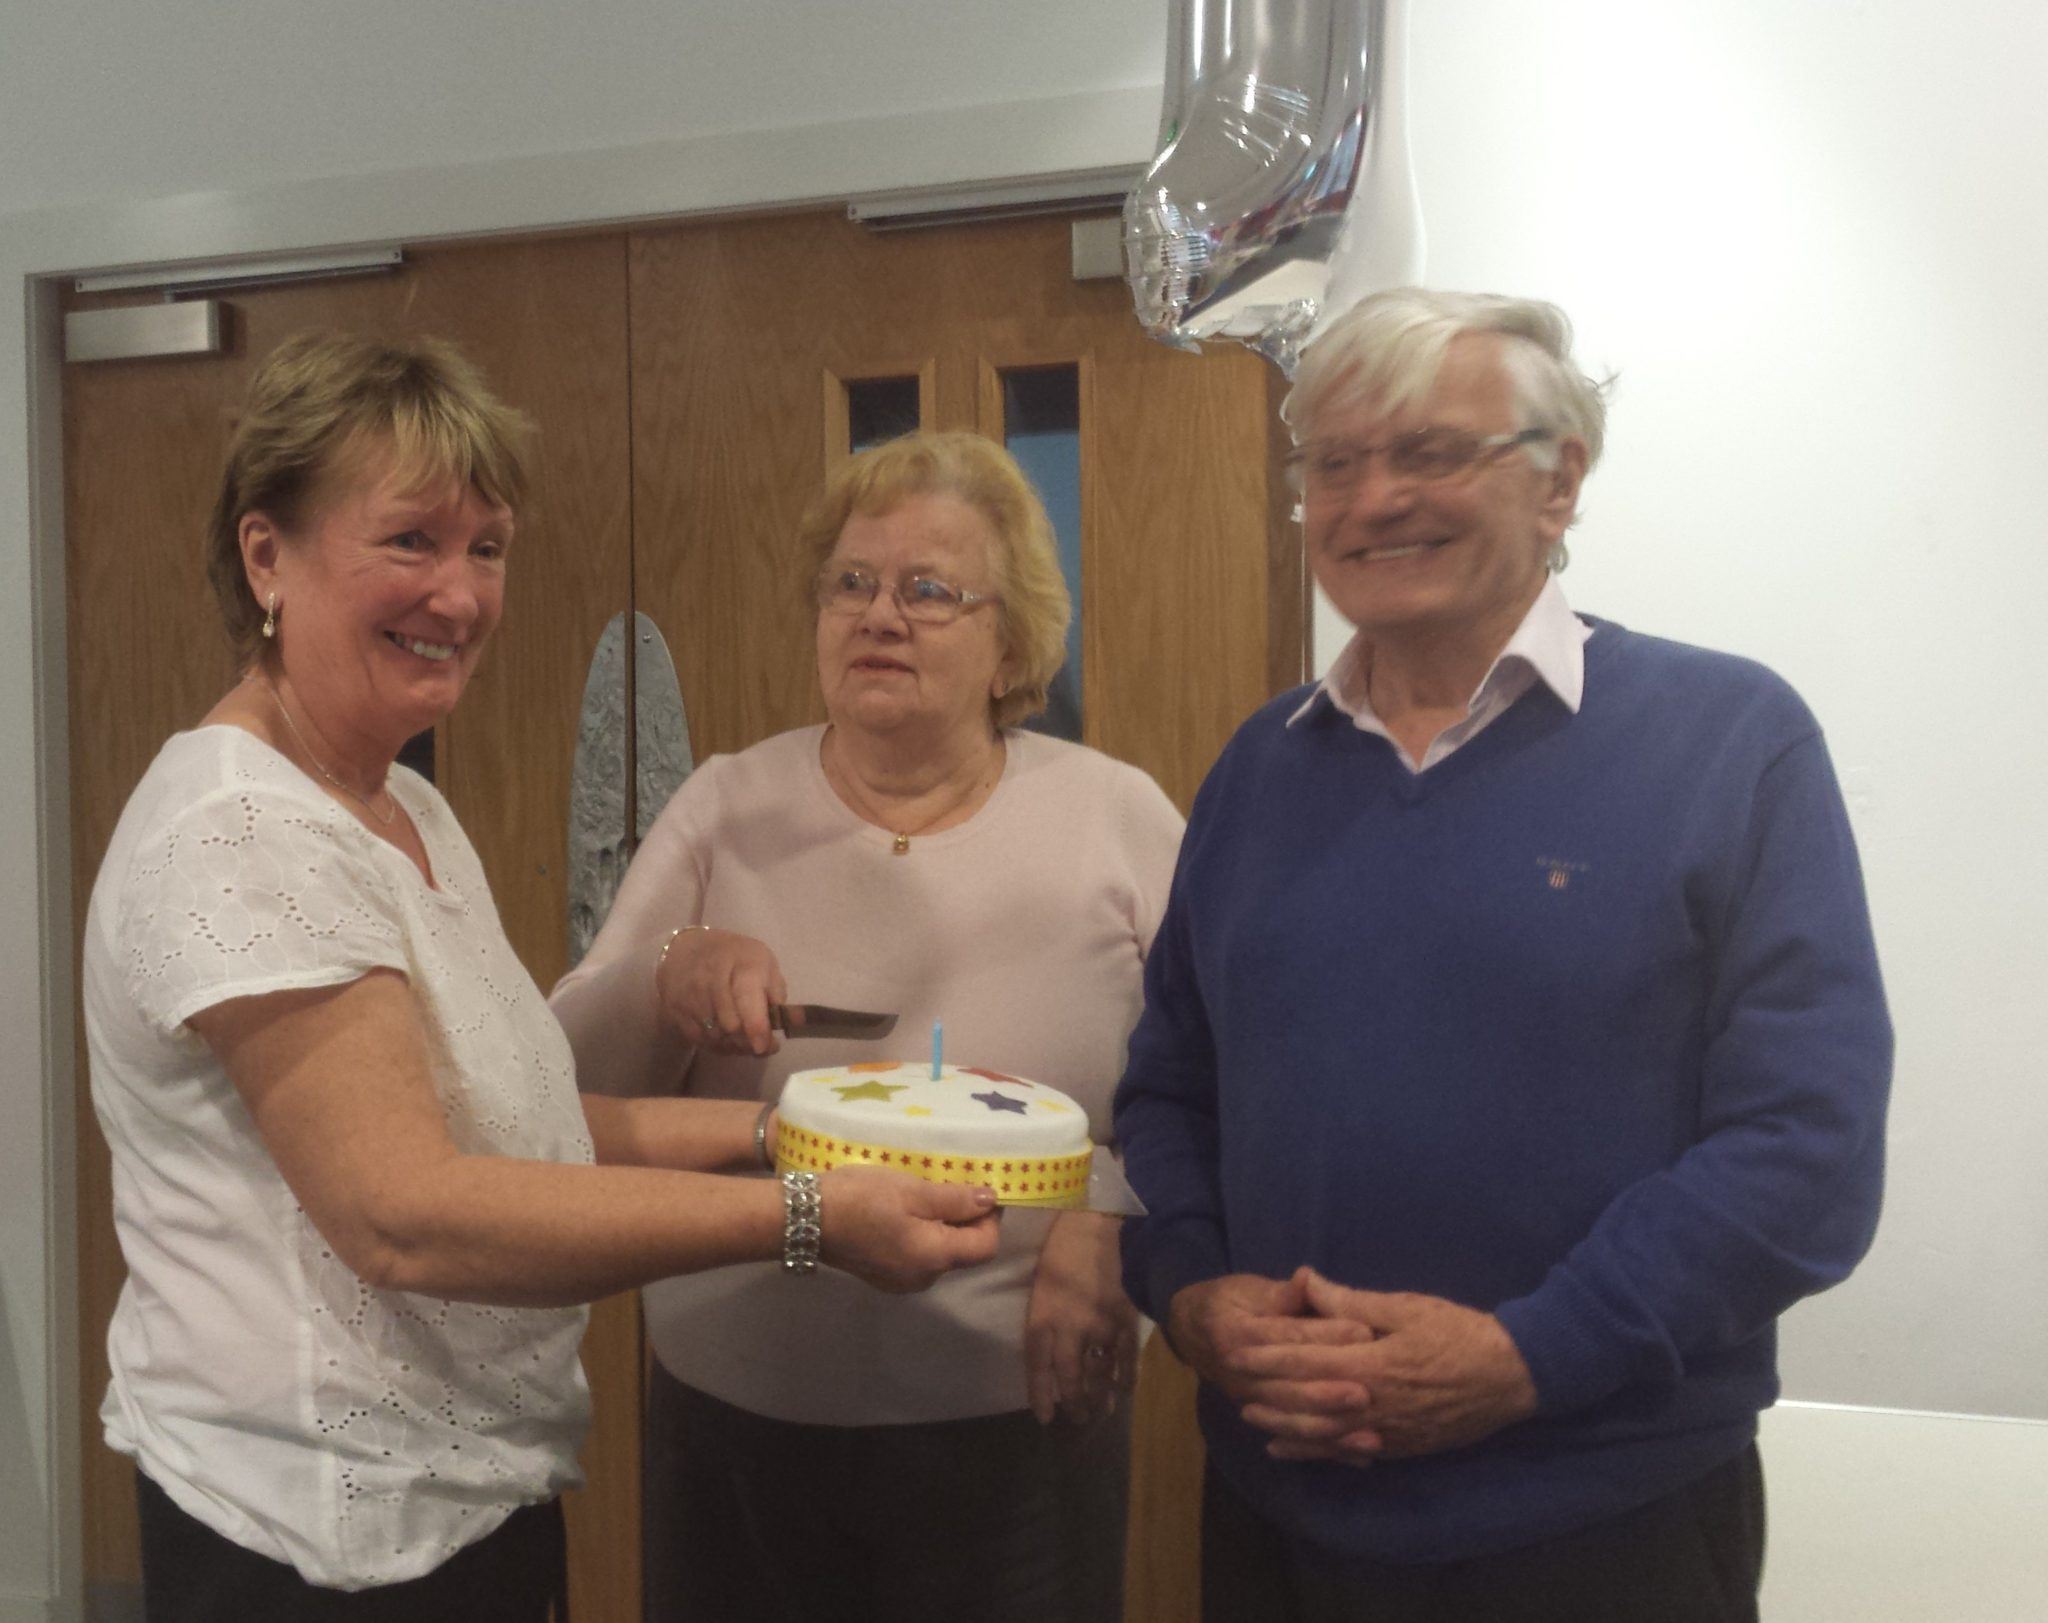 Sheila, Ian and Eileen cut the birthday cake